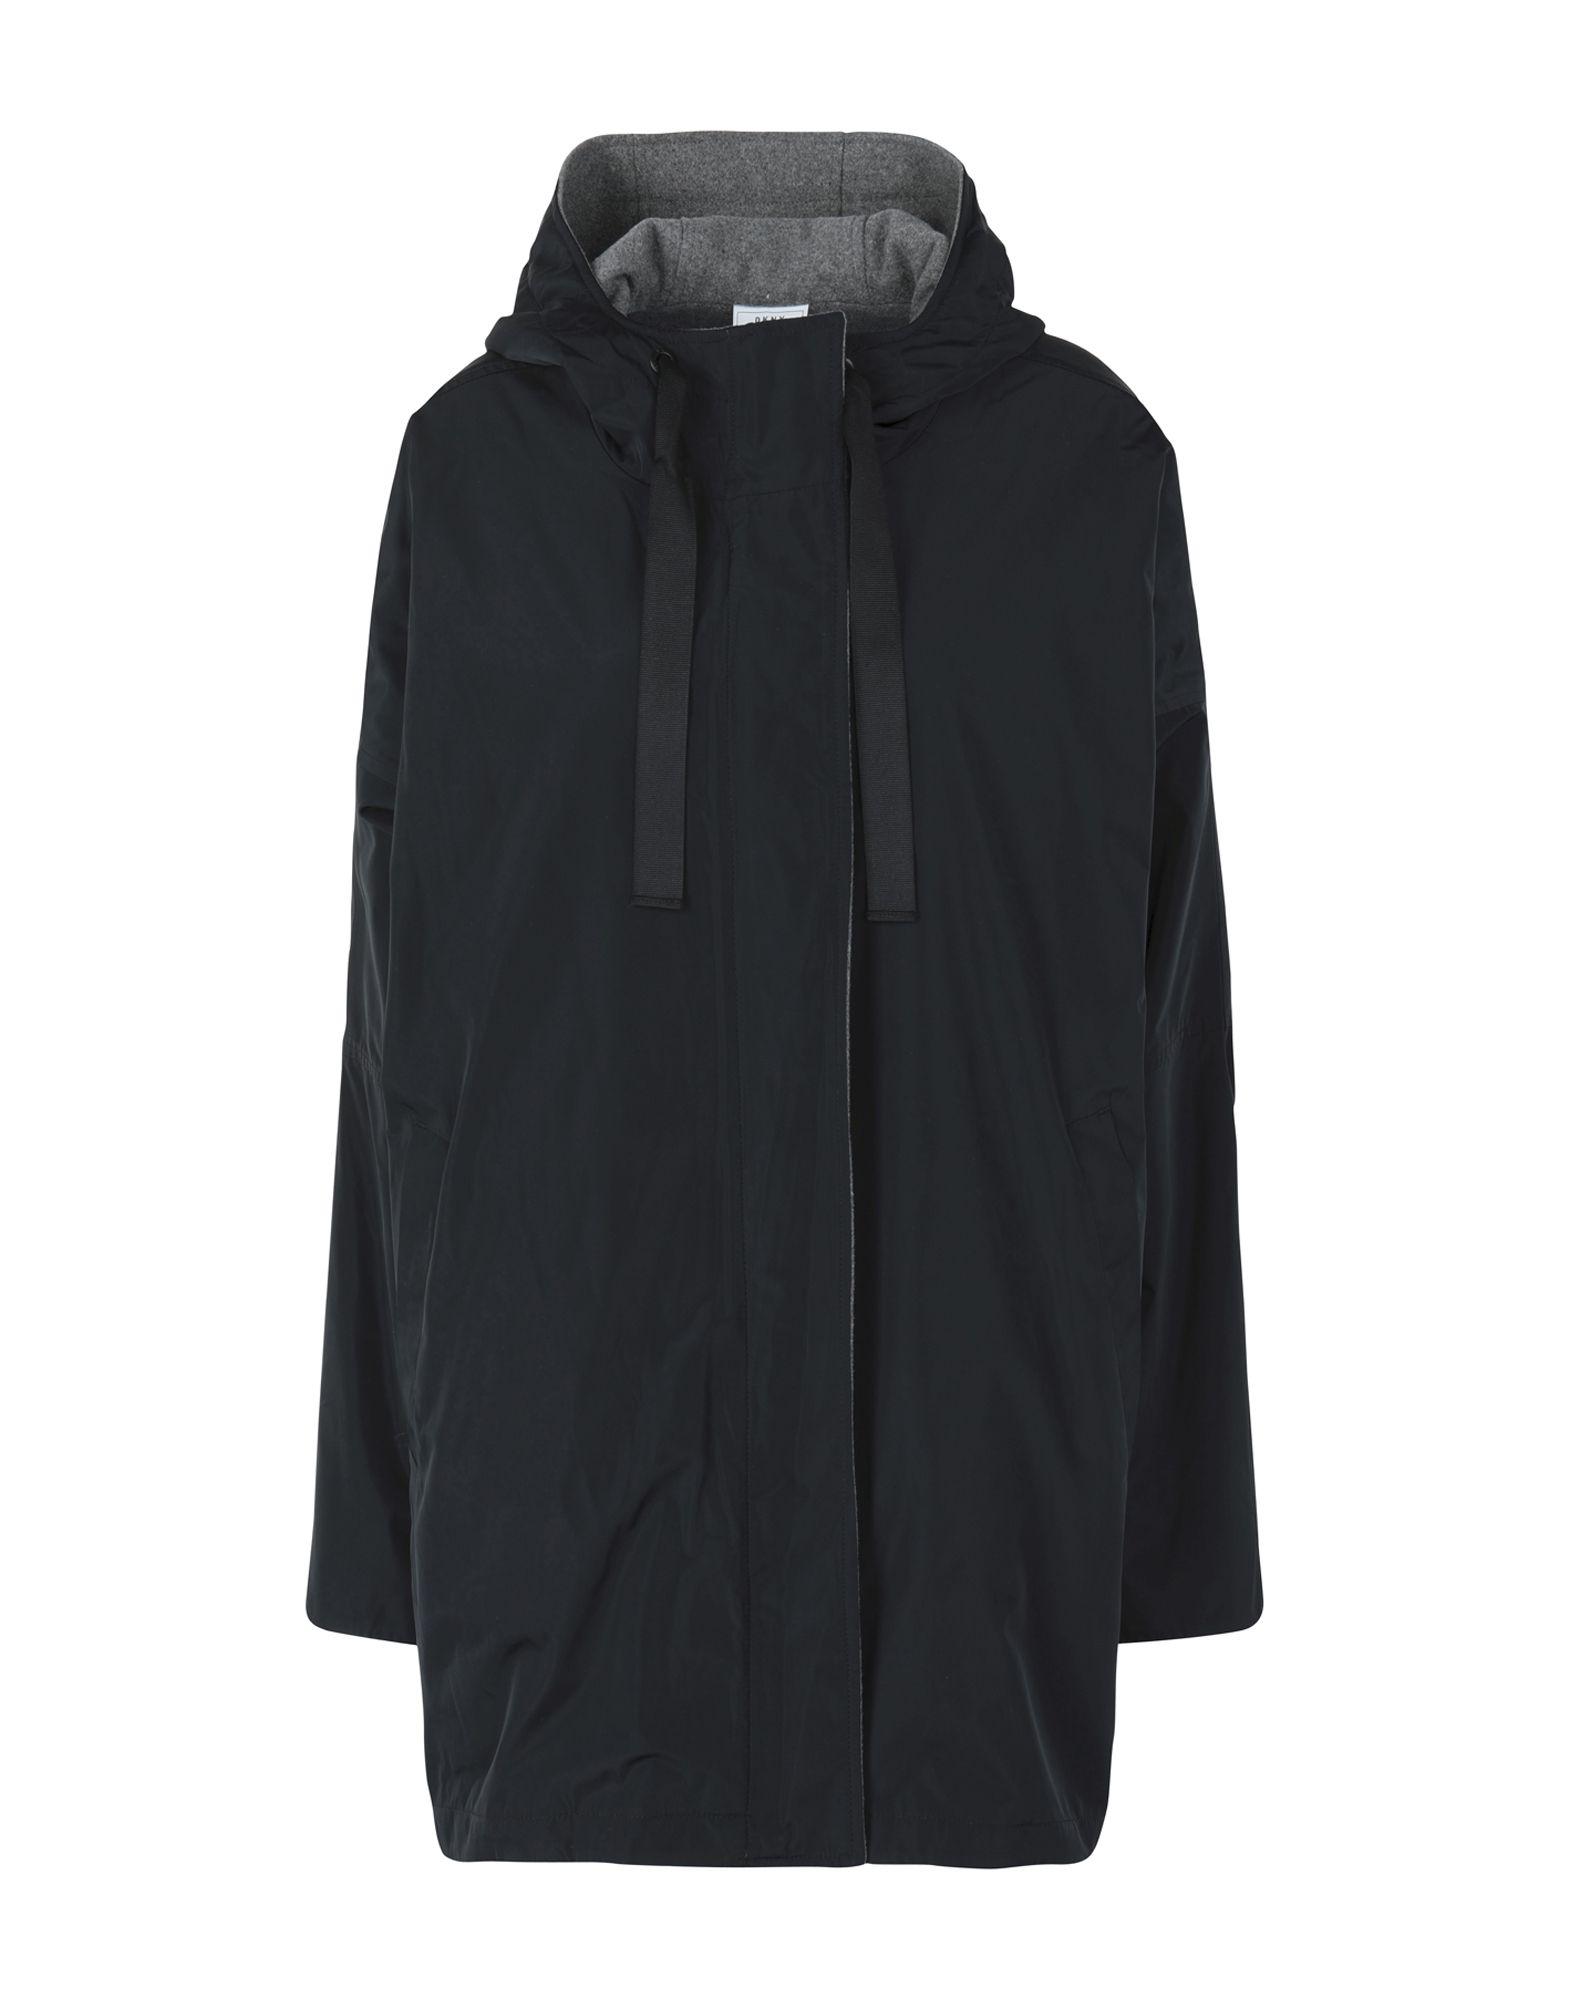 Фото - DKNY Куртка обувь на высокой платформе dkny